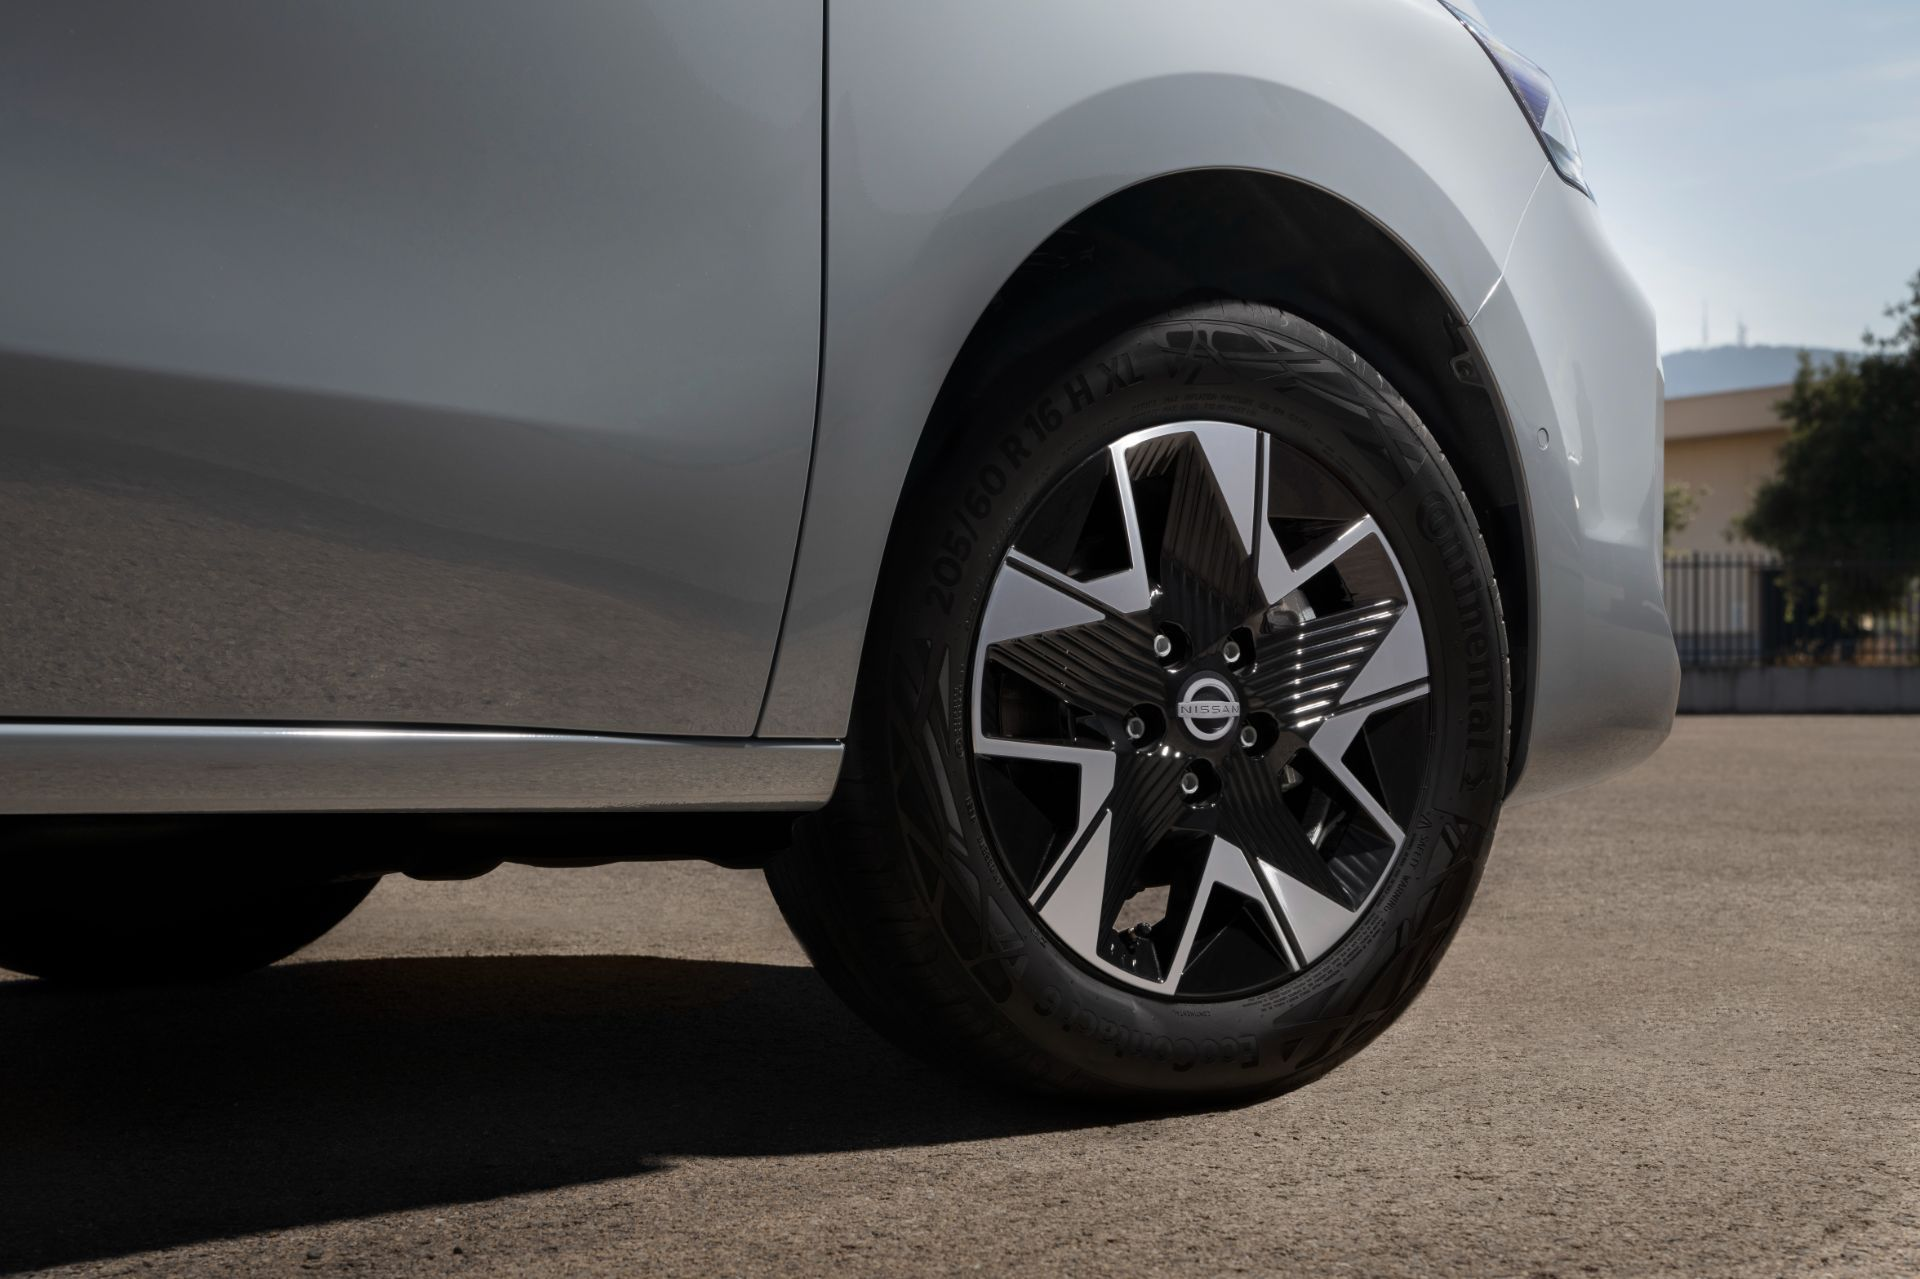 2022-Nissan-Townstar-petrol-van-dynamic-25